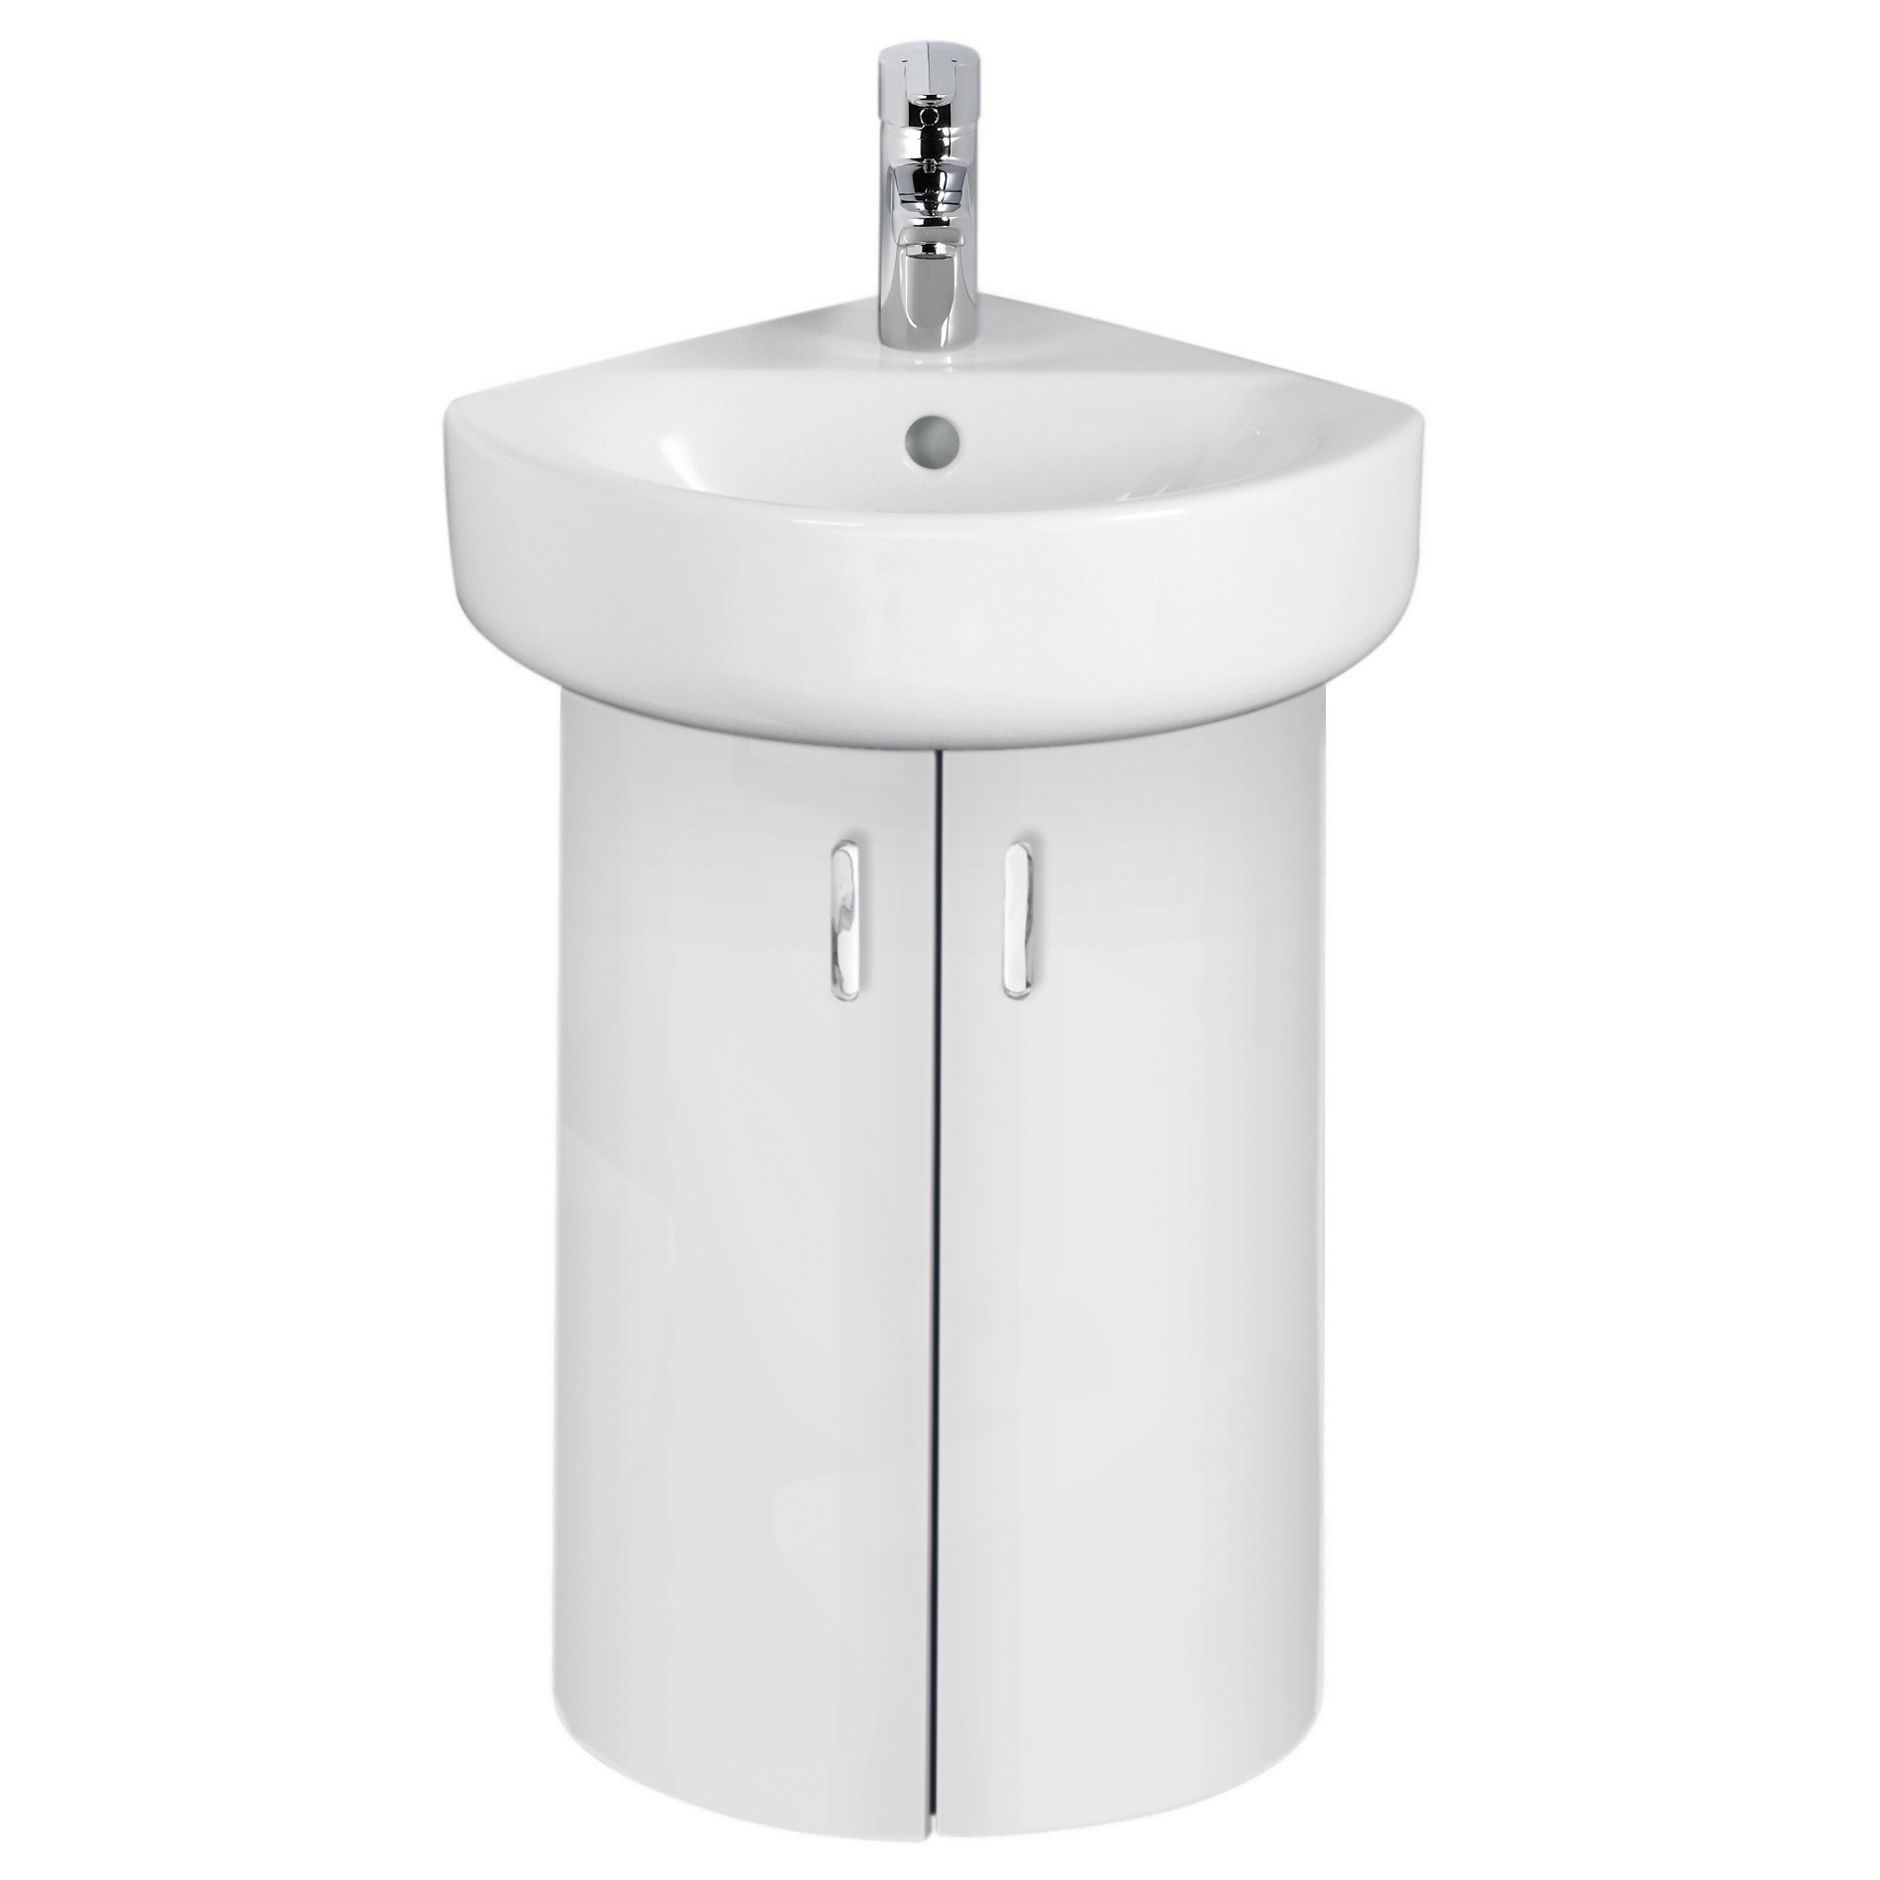 ideal standard imagine compact white vanity corner unit basin mixer pack